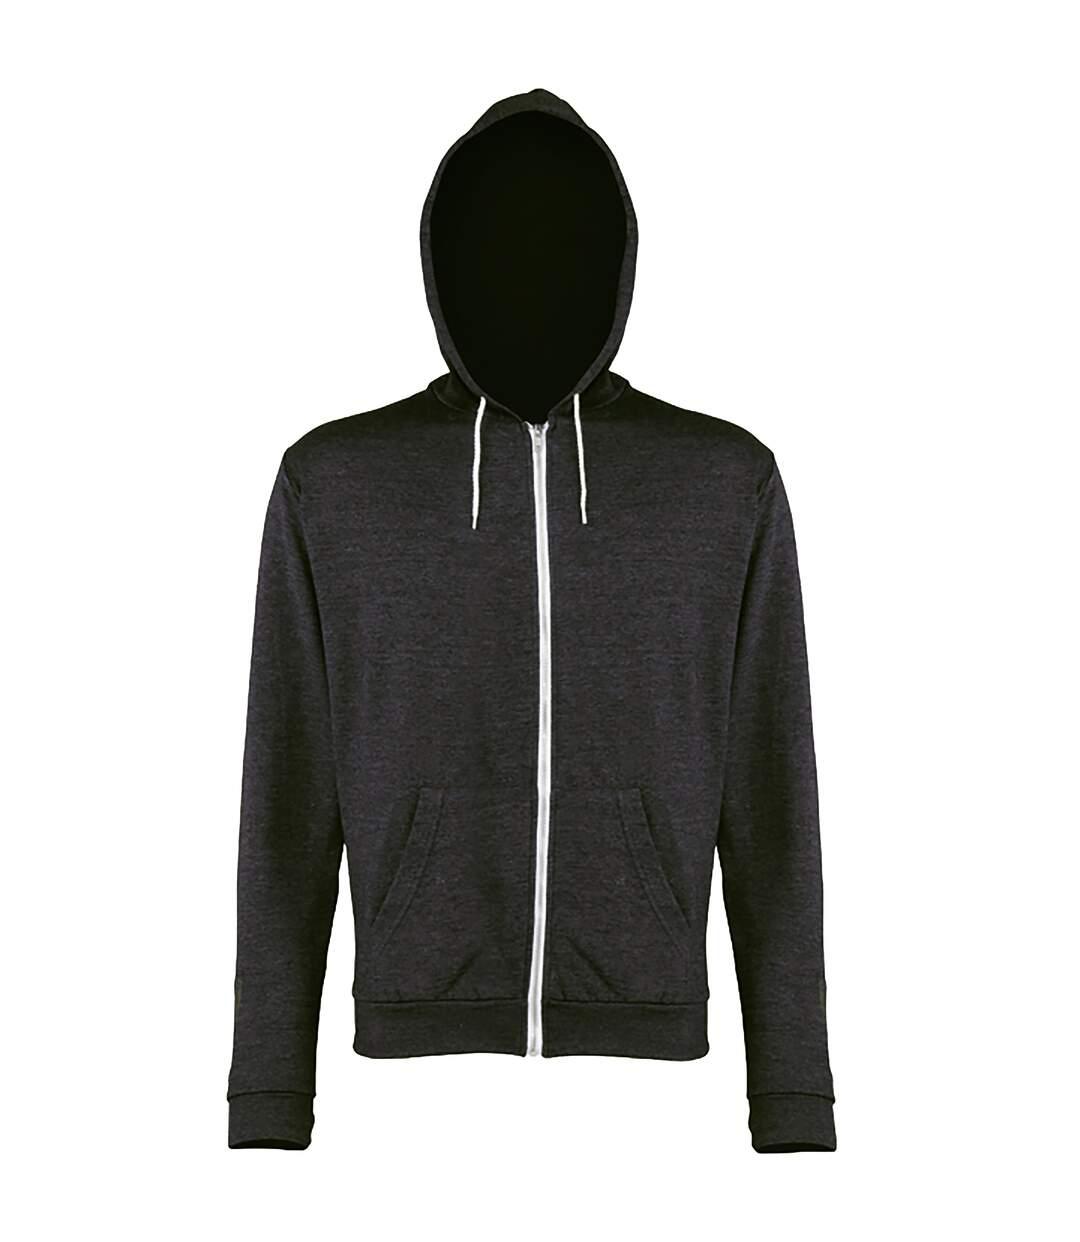 Awdis Mens Heather Lightweight Hooded Sweatshirt / Hoodie / Zoodie (Black Heather) - UTRW184